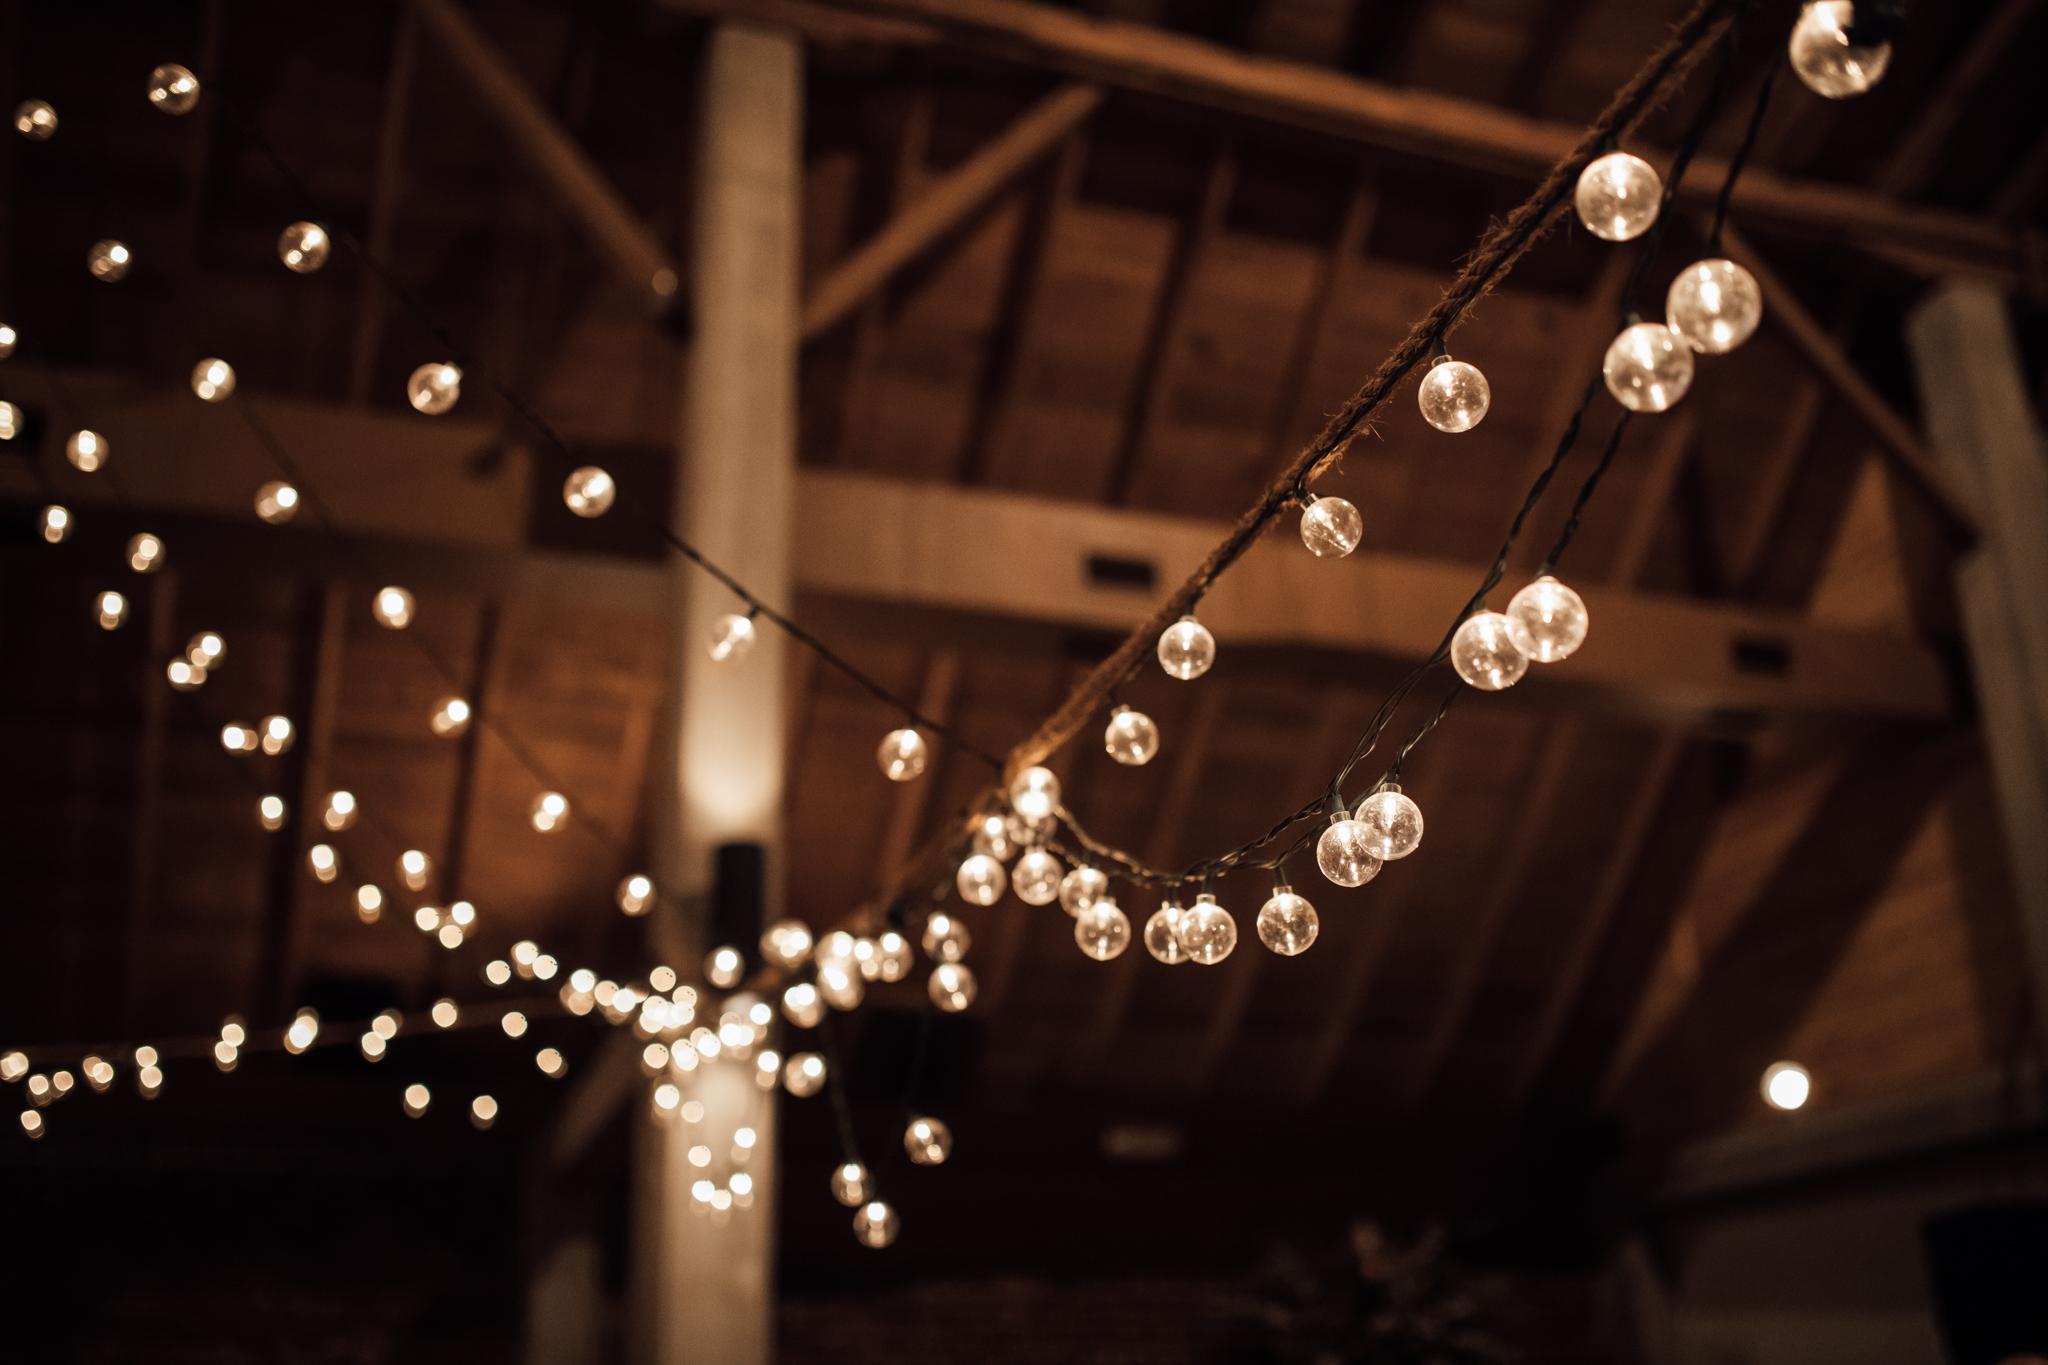 birmingham-alabama-wedding-photographer-laura-terry-the-warmth-around-you (82 of 110).jpg